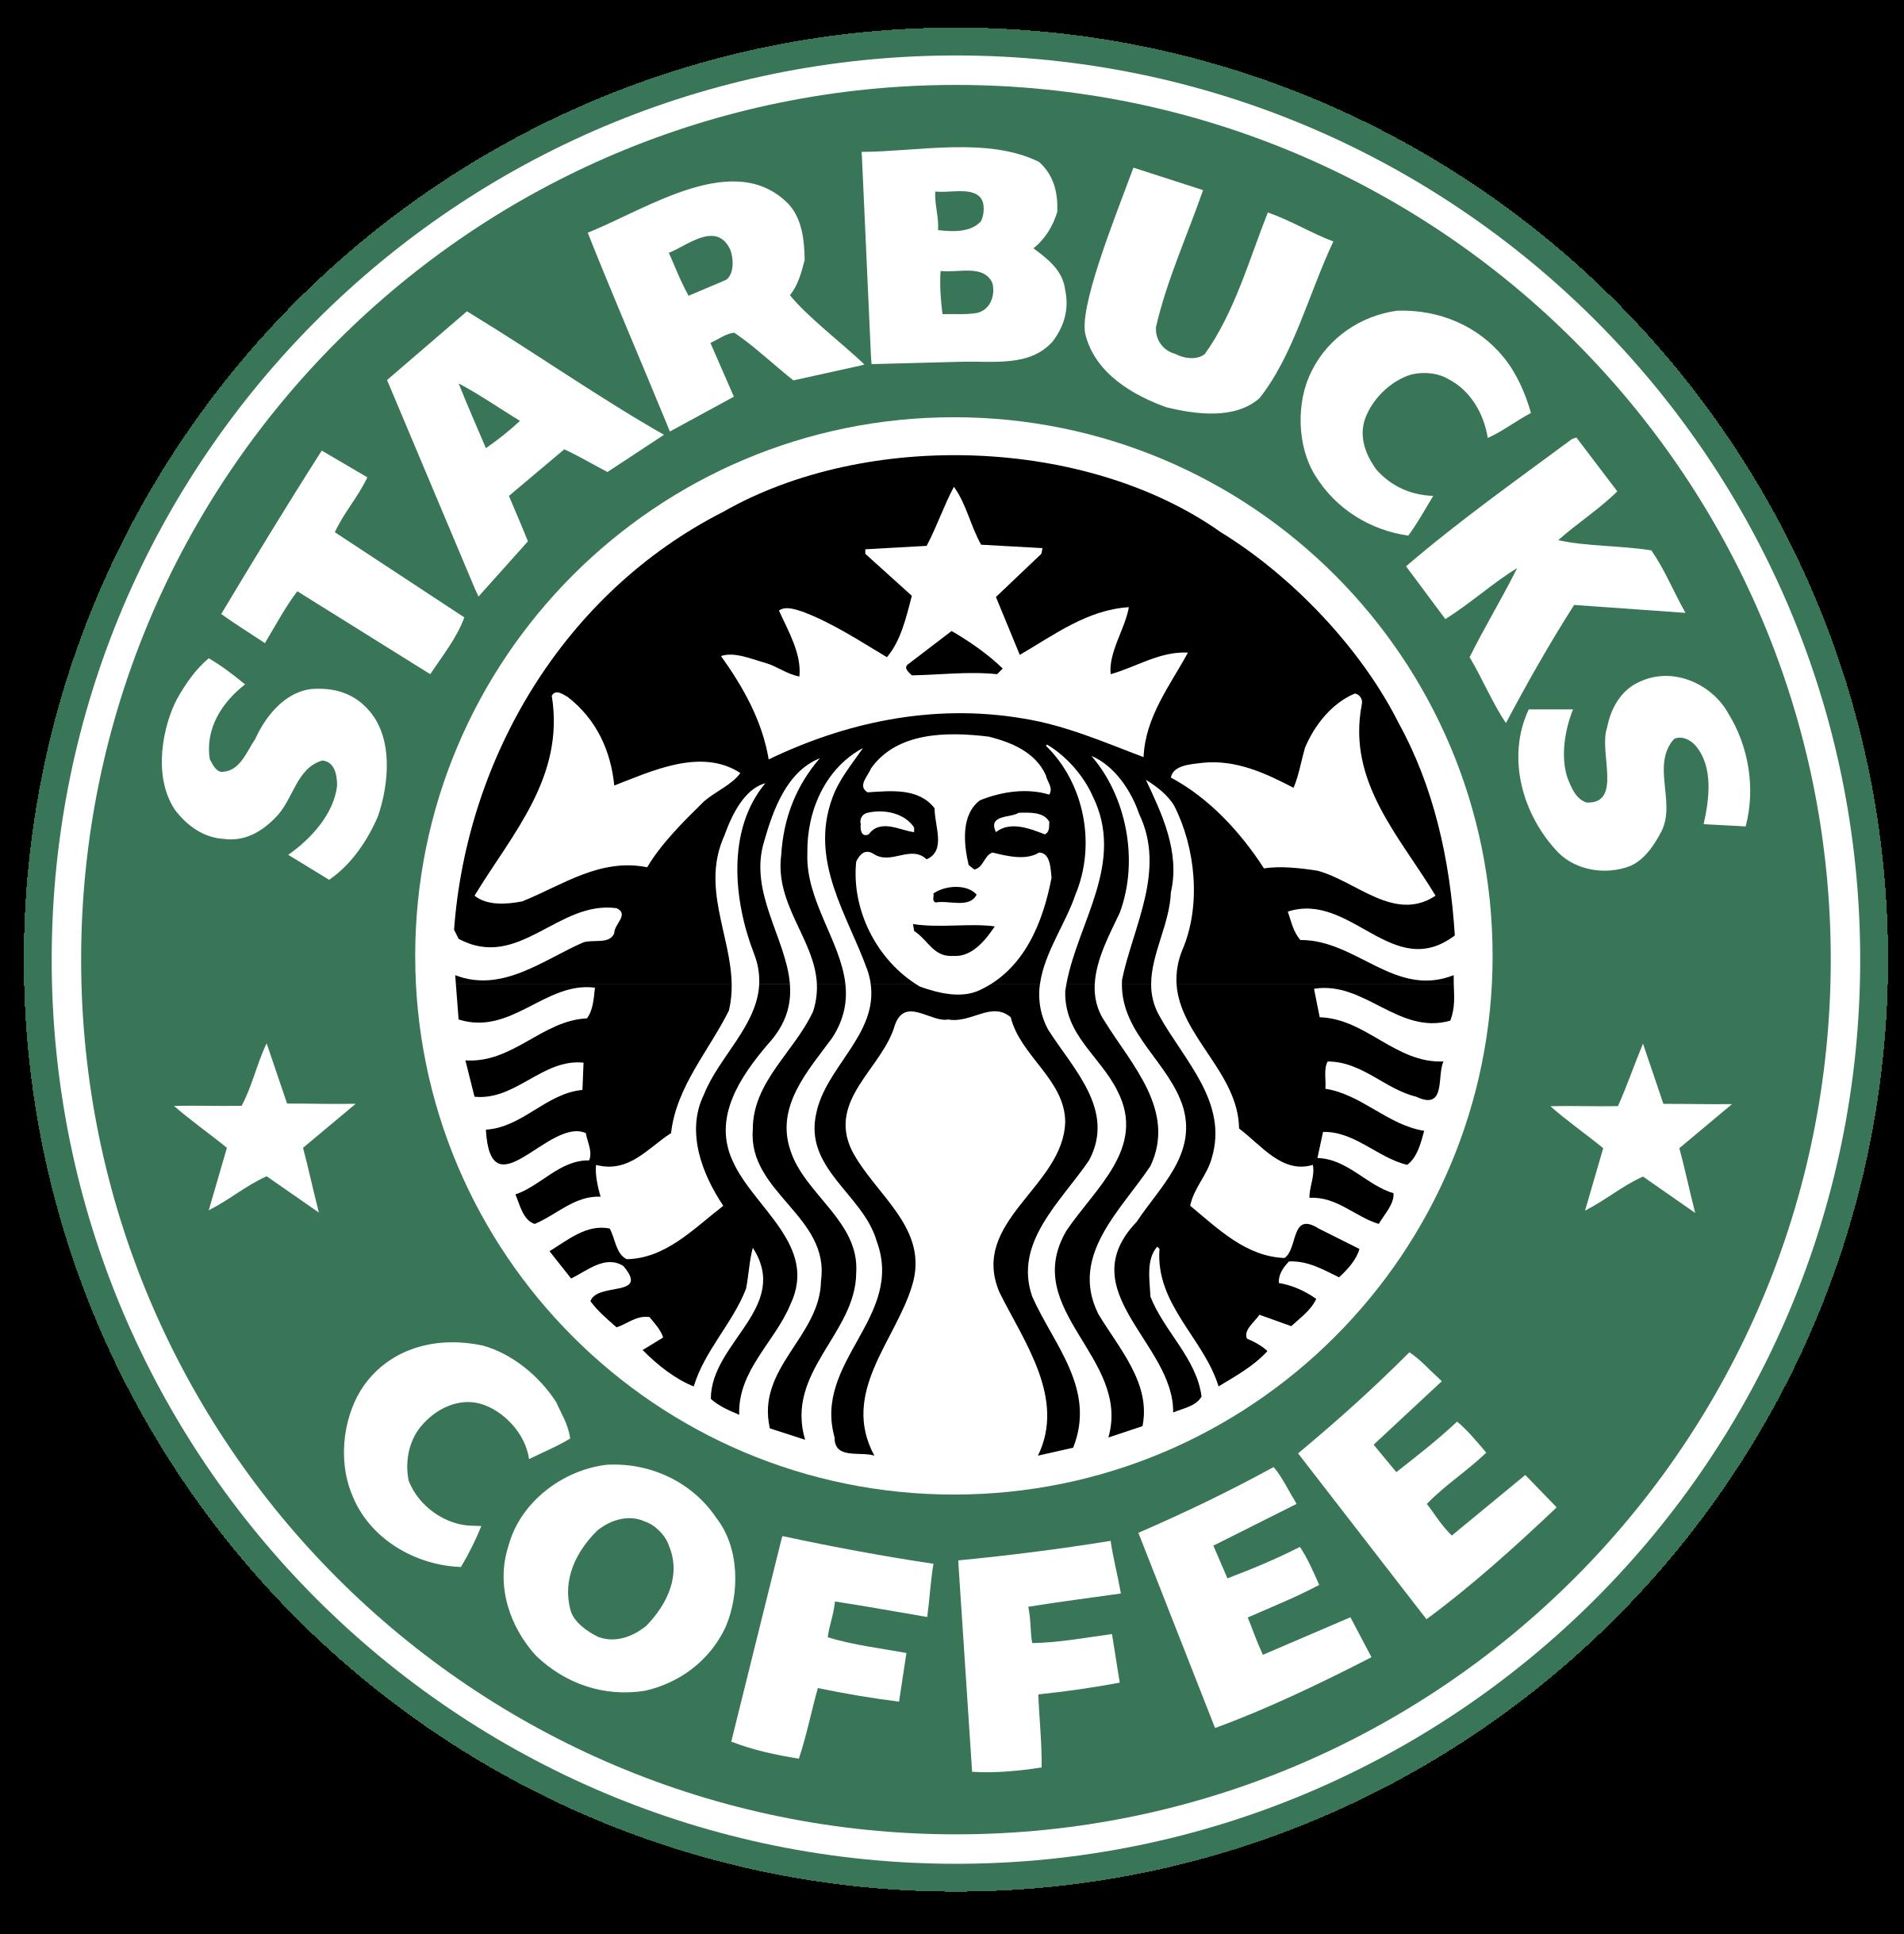 starbucks coffee logo png transparent svg vector freebie supply rh freebiesupply com starbuck coffee vector logo starbucks logo vector png